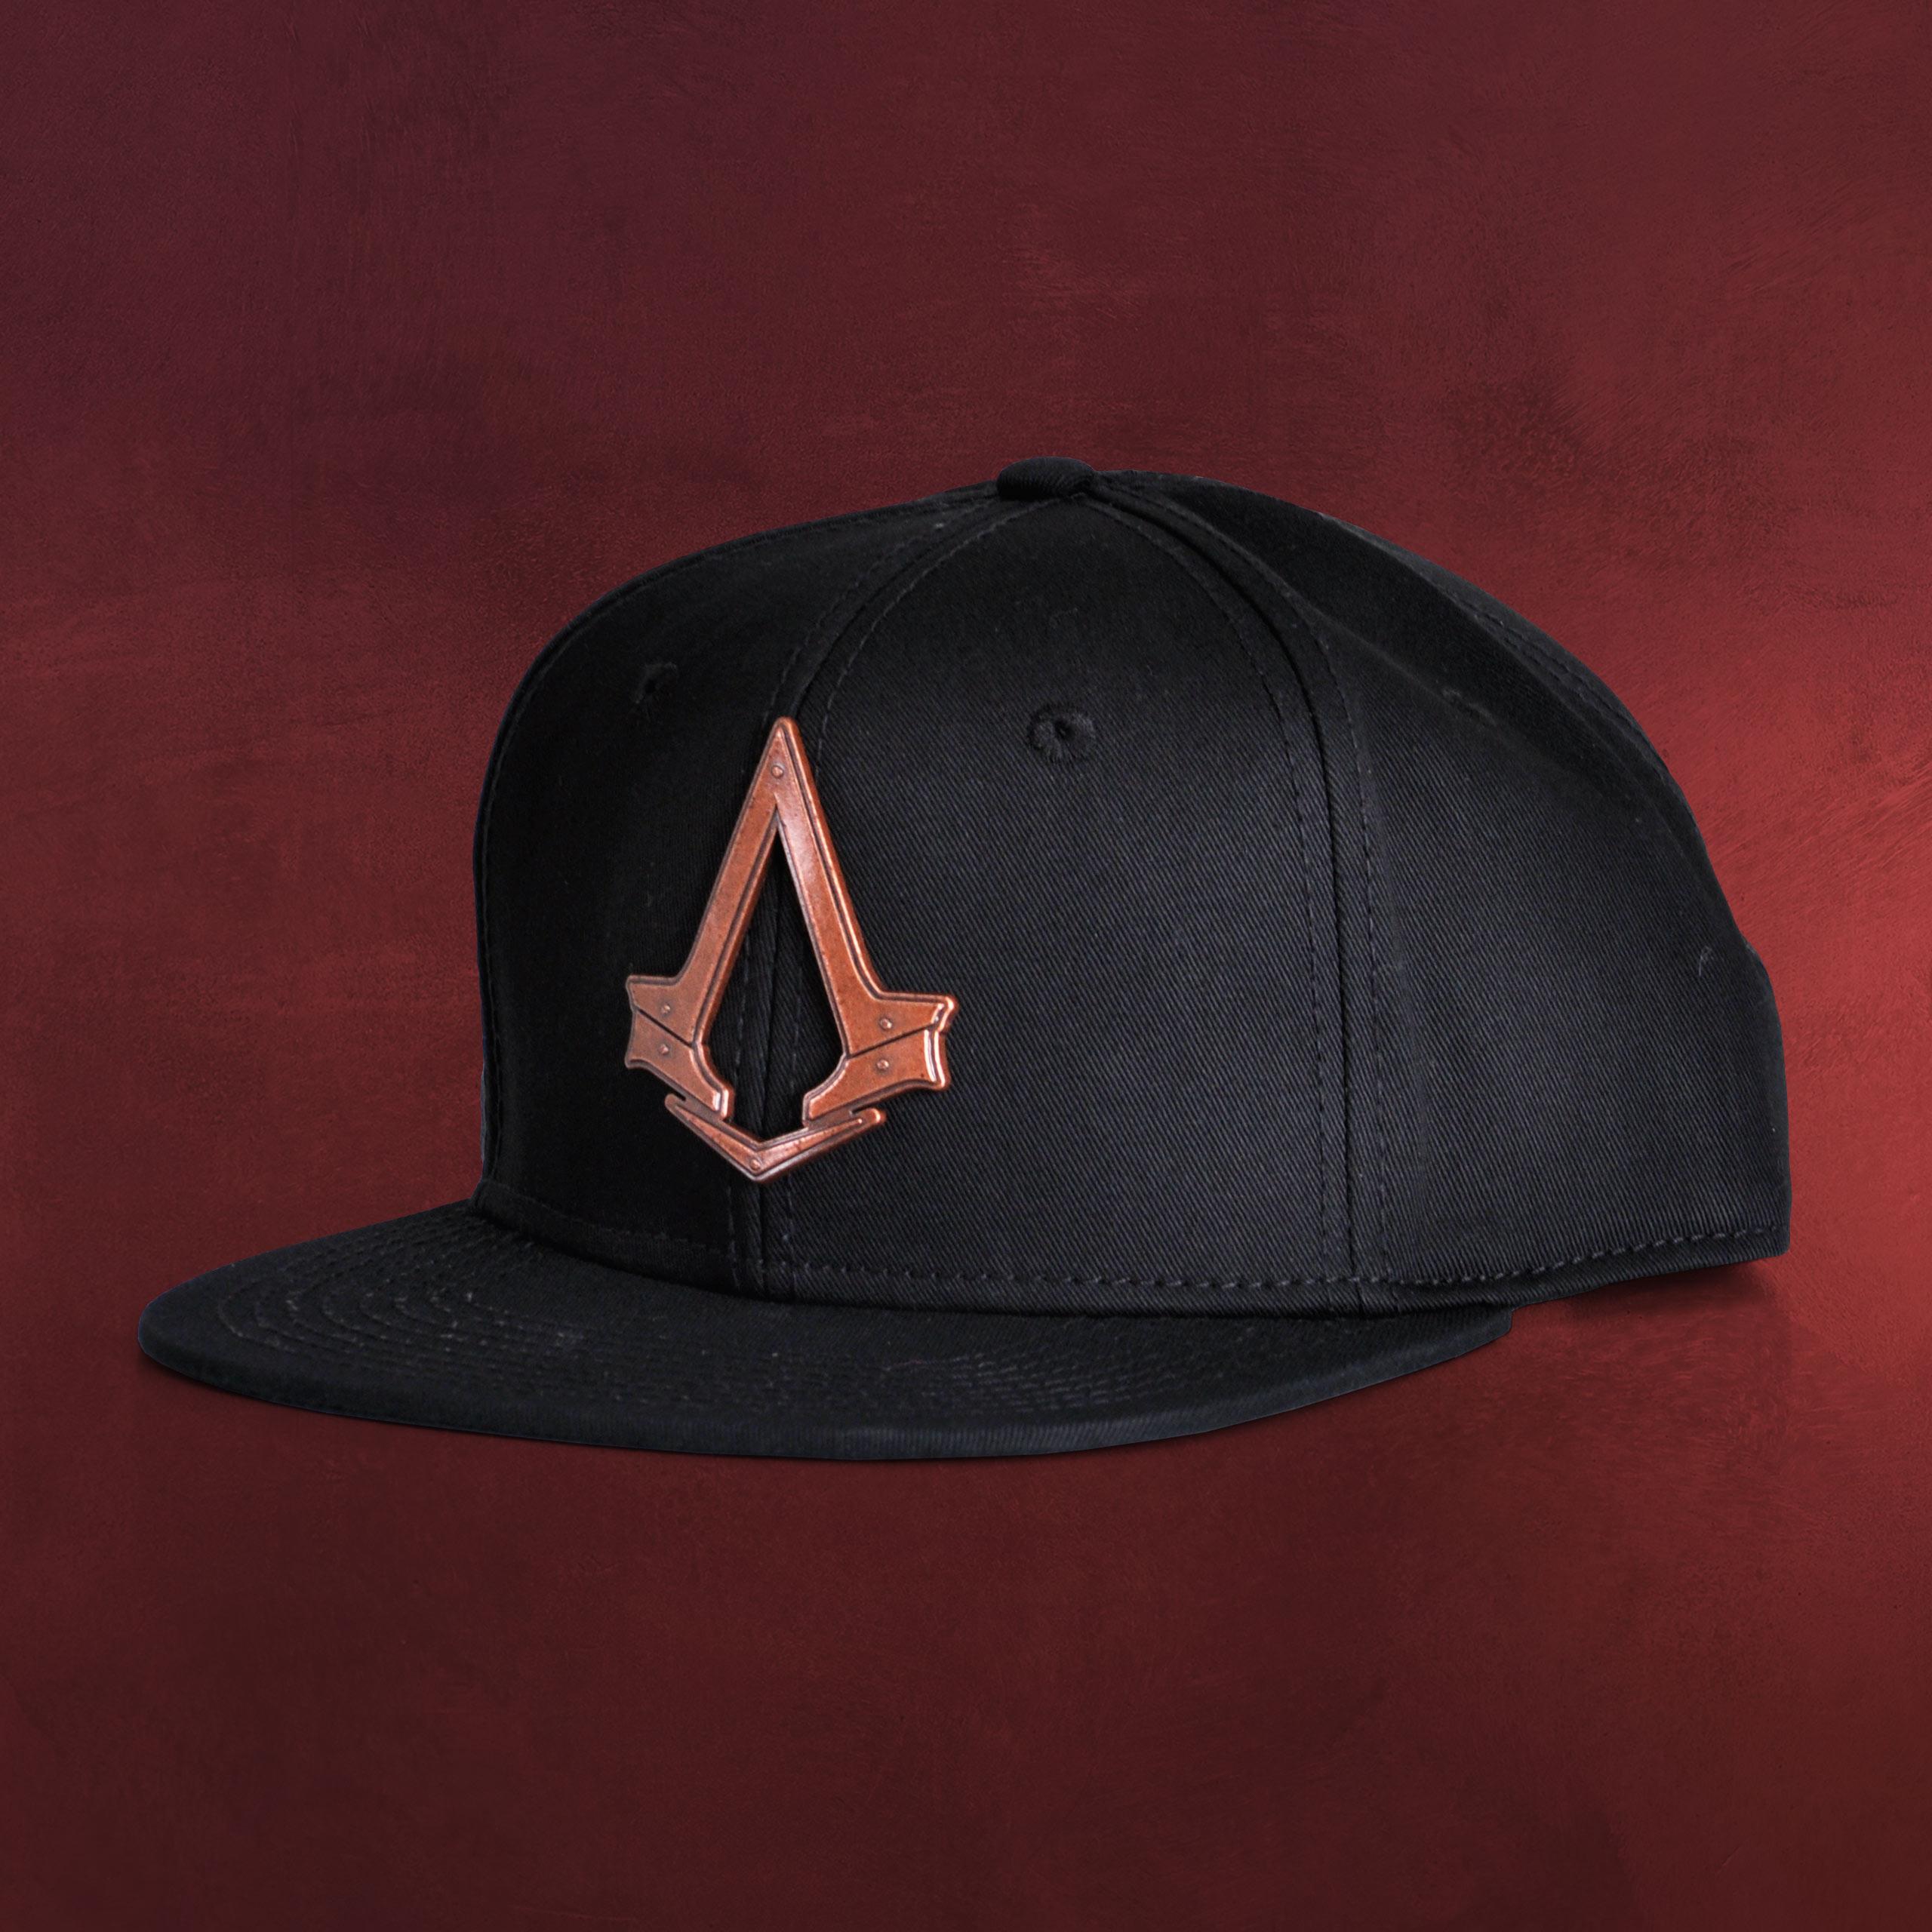 5150b77cf824a Assassins Creed - Syndicate Bronze Logo Snapback Cap